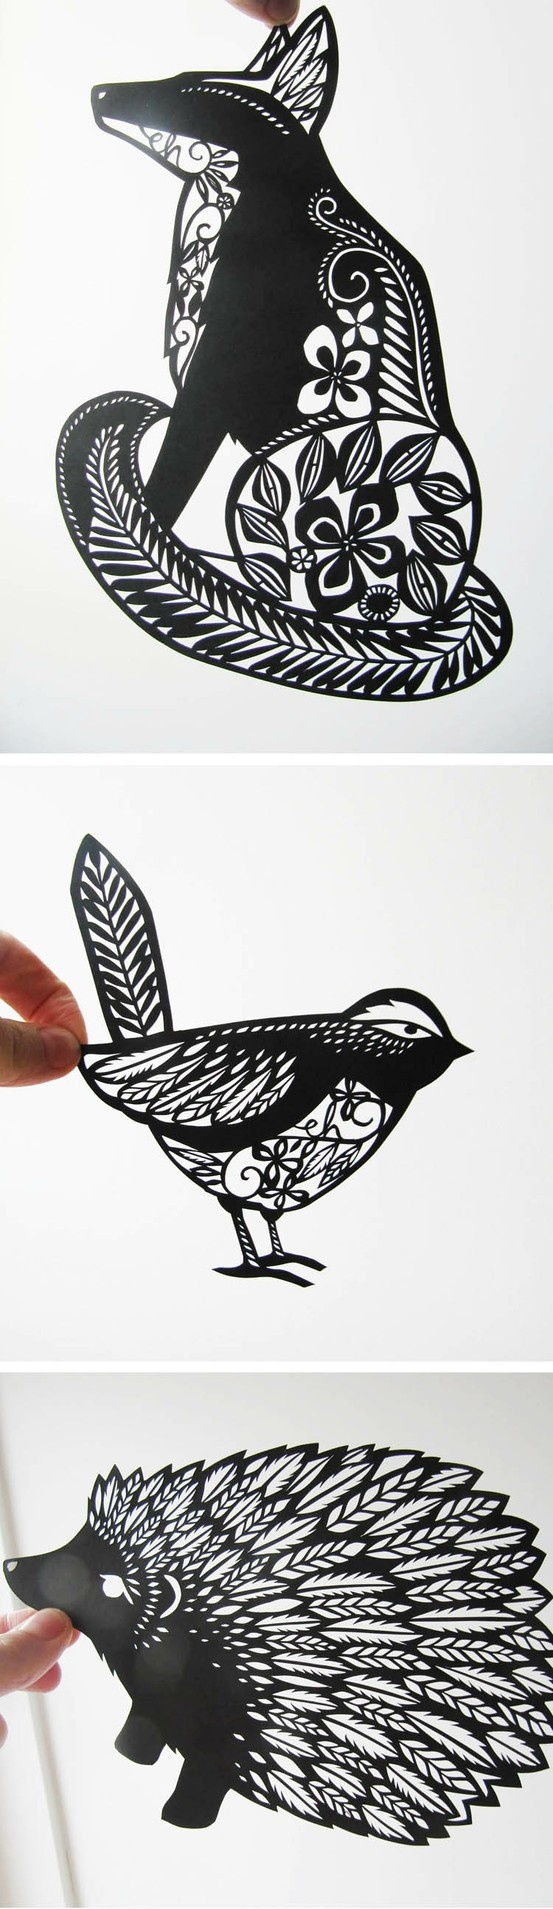 paper cutout art 9